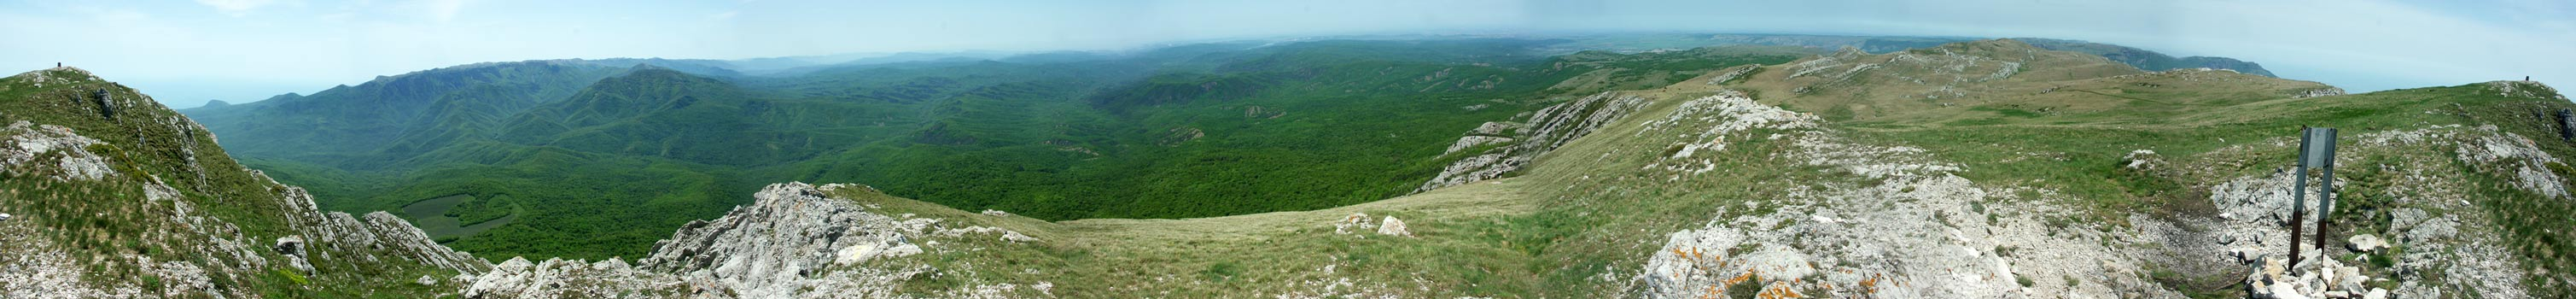 panorama2_4